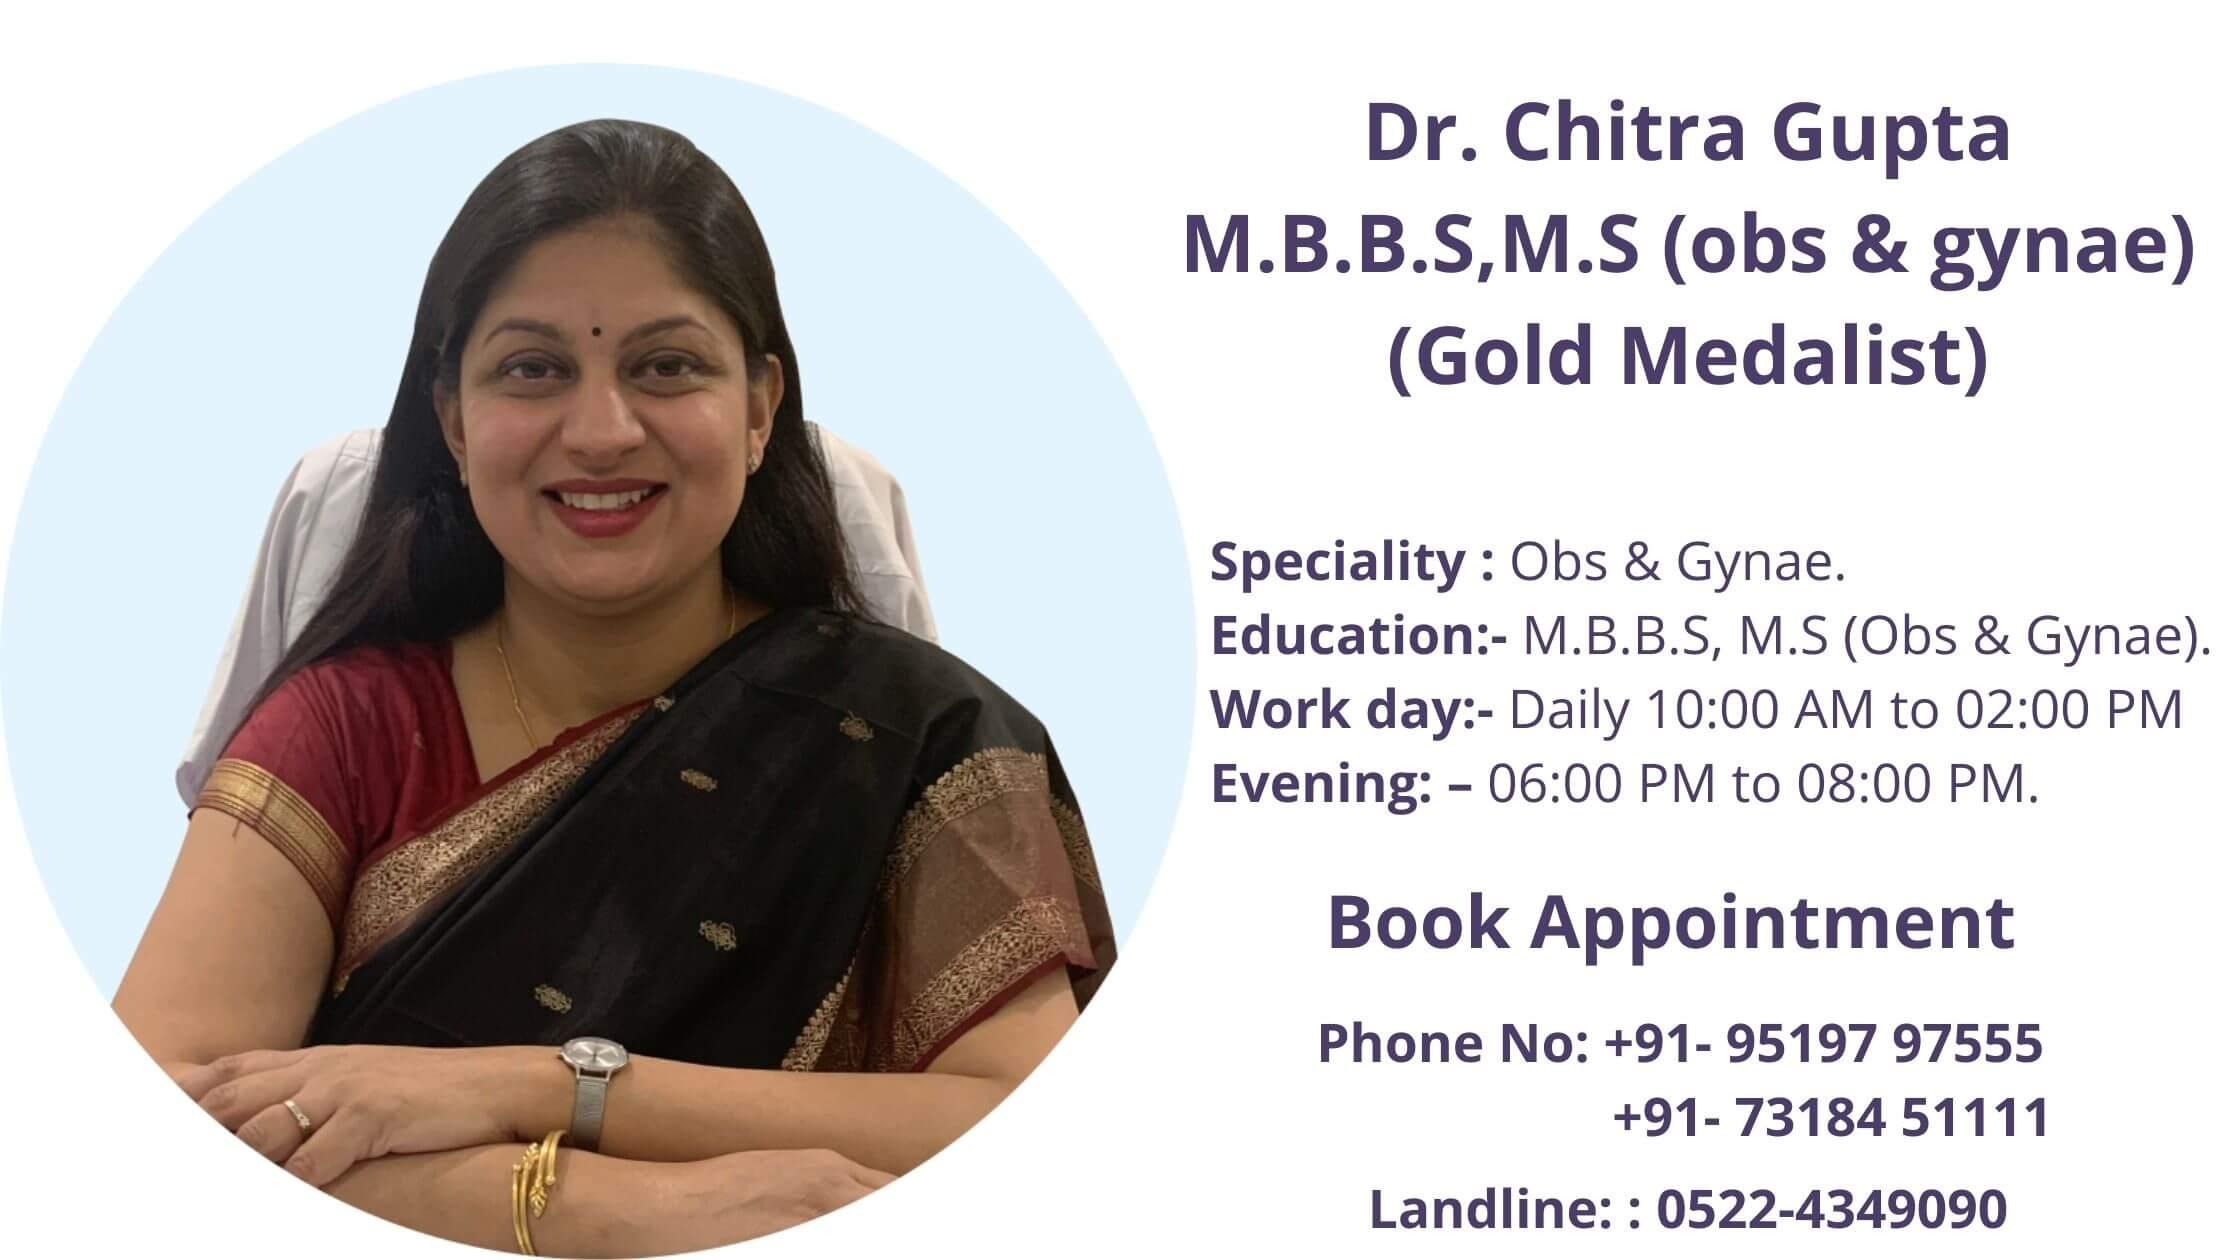 Dr Chitra Gupta - Gynaecologist in Gomati Nagar